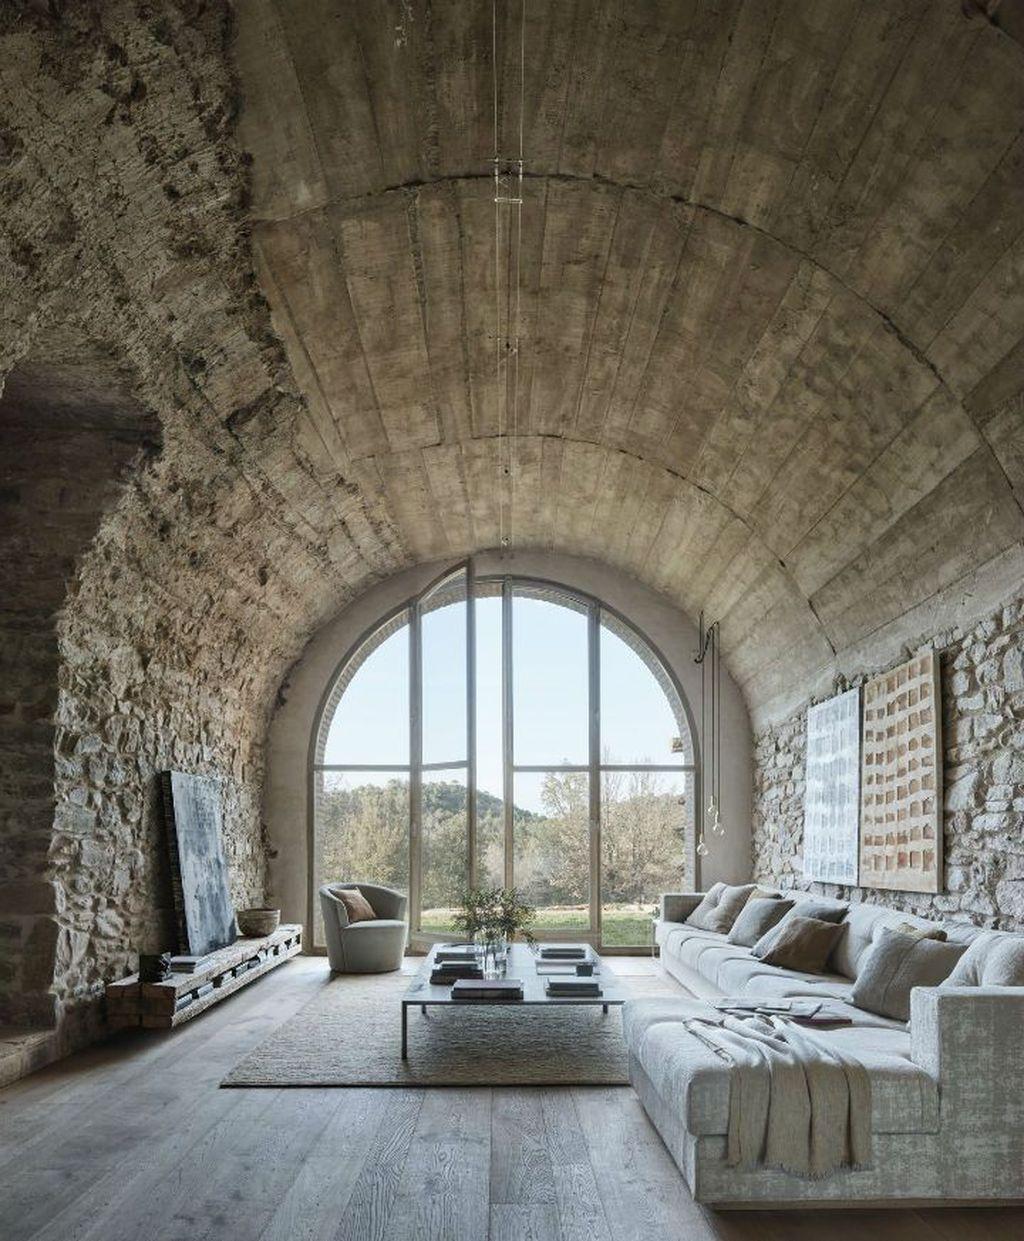 Stunning Farmhouse Interior Design Ideas To Realize Your Dreams 31